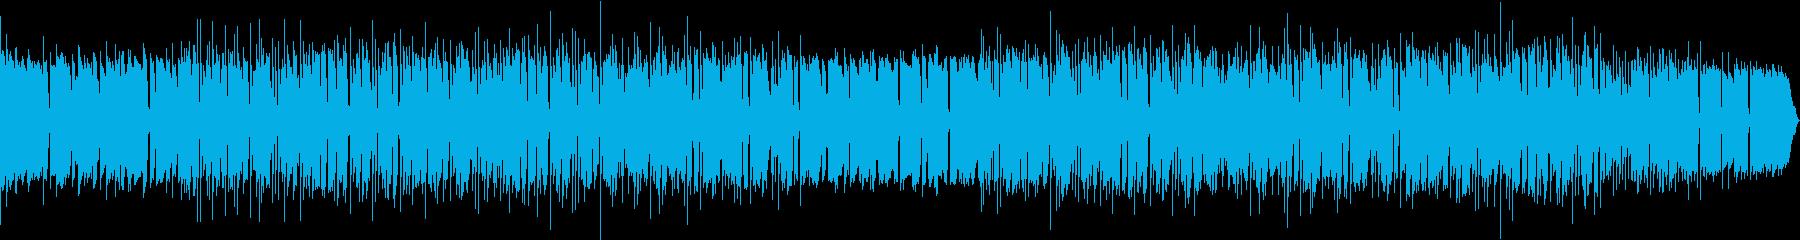 Lo-Fi Beats ボサノバ風の再生済みの波形